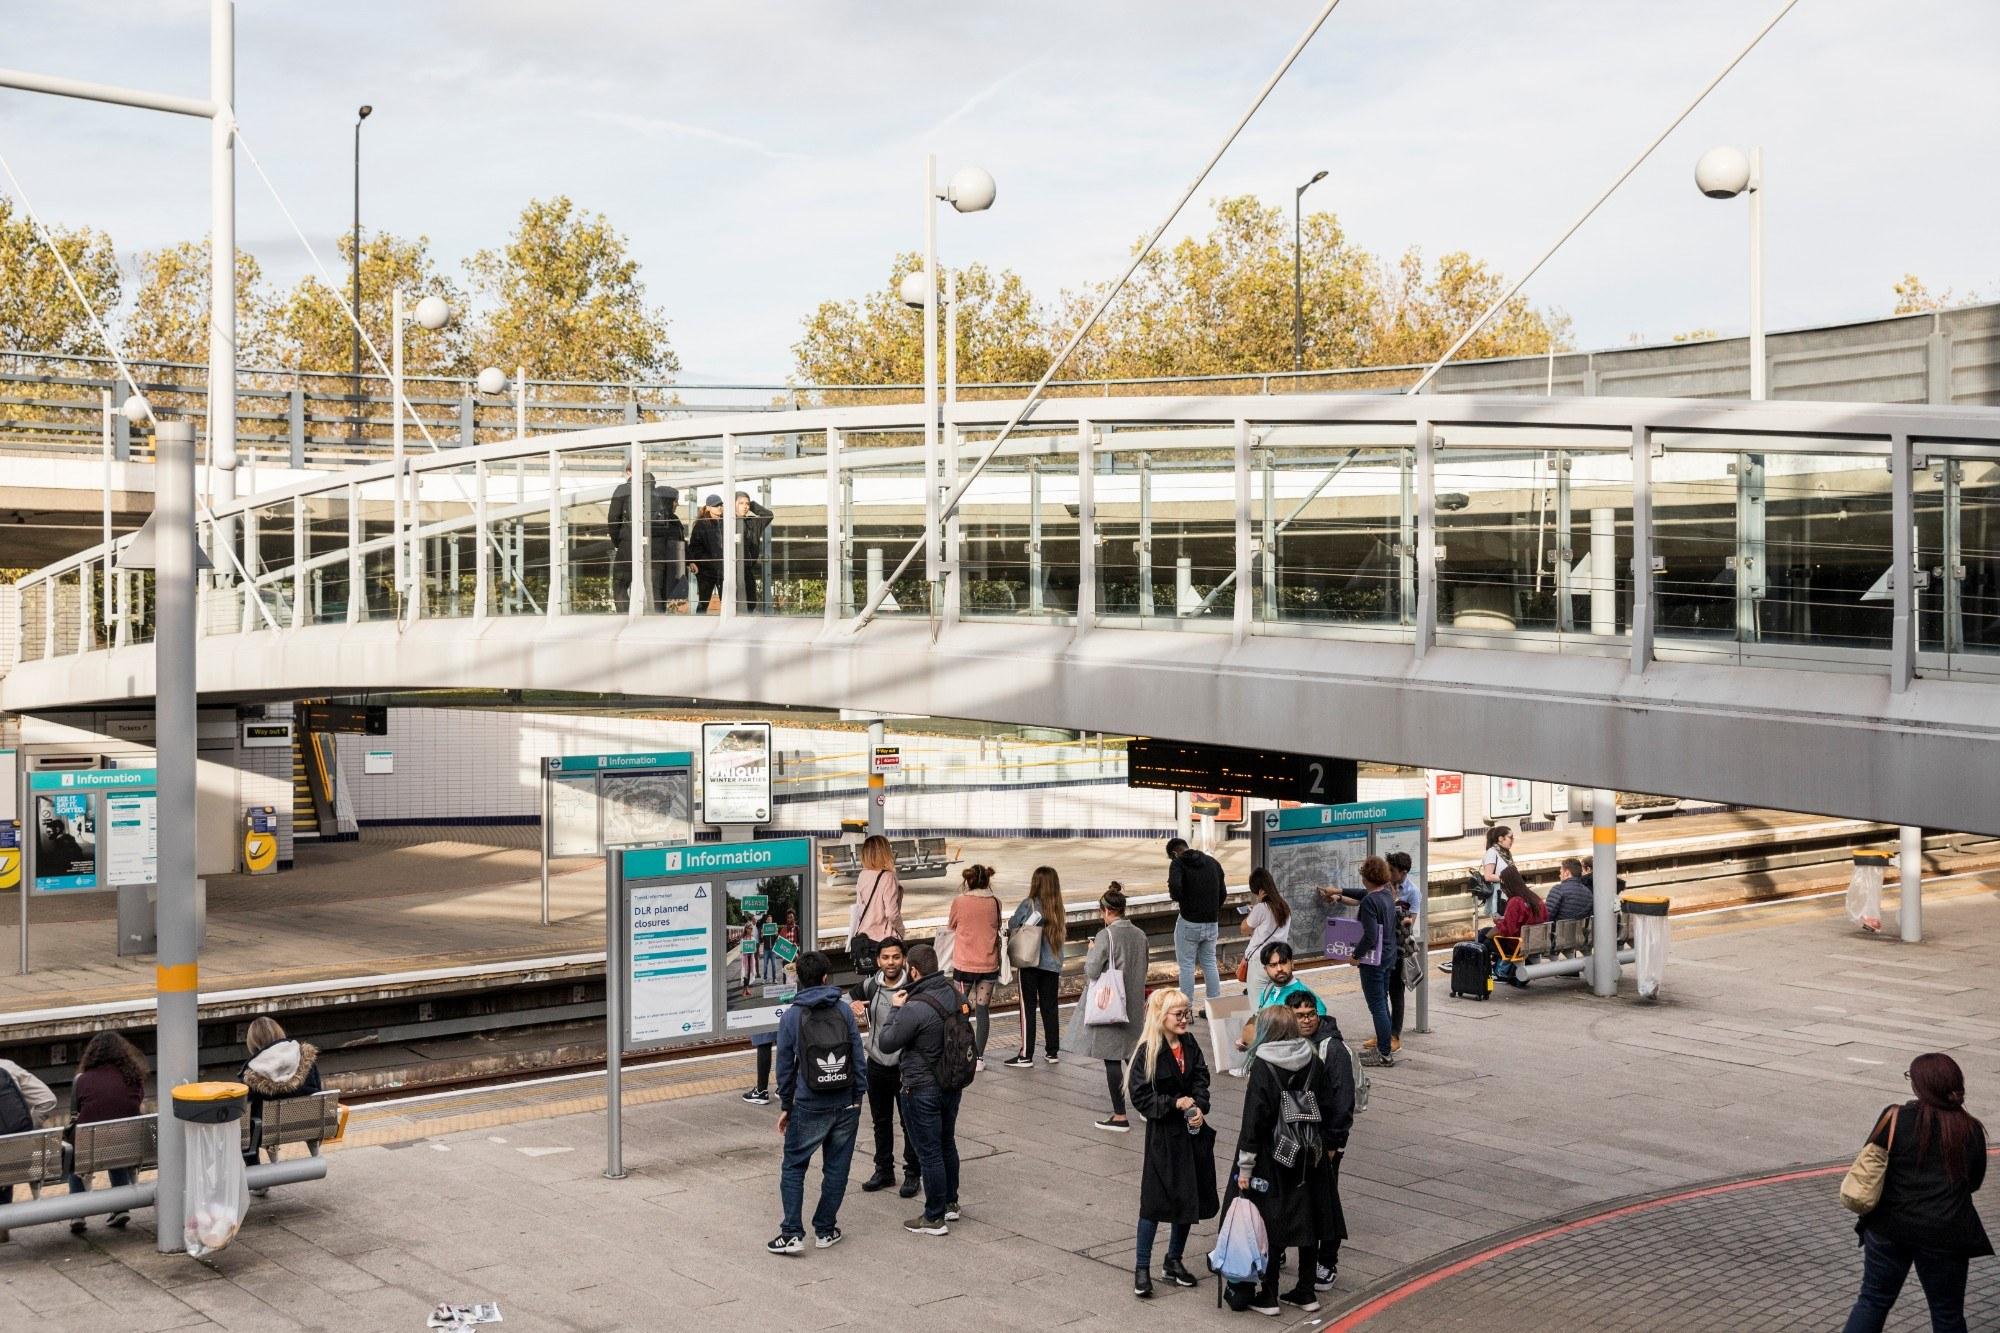 Beckton Park station in the Royal Docks